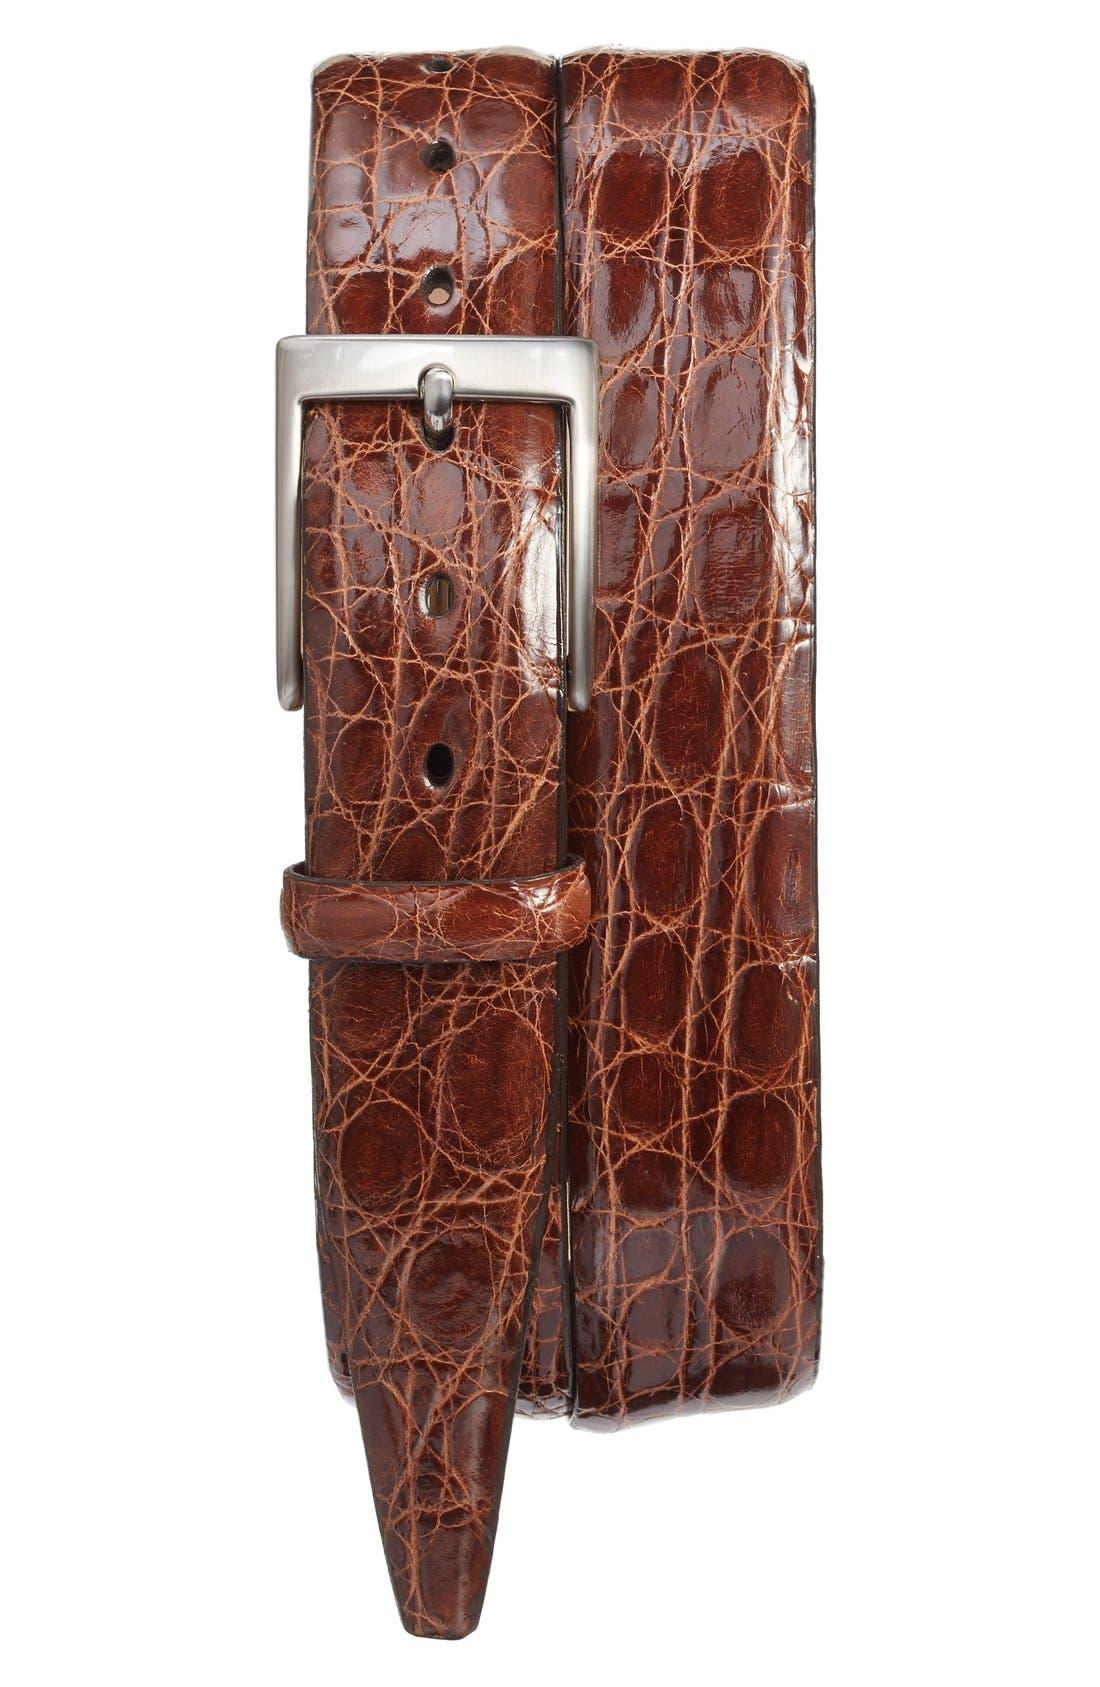 Caiman Alligator Leather Belt,                         Main,                         color, Cognac Brown